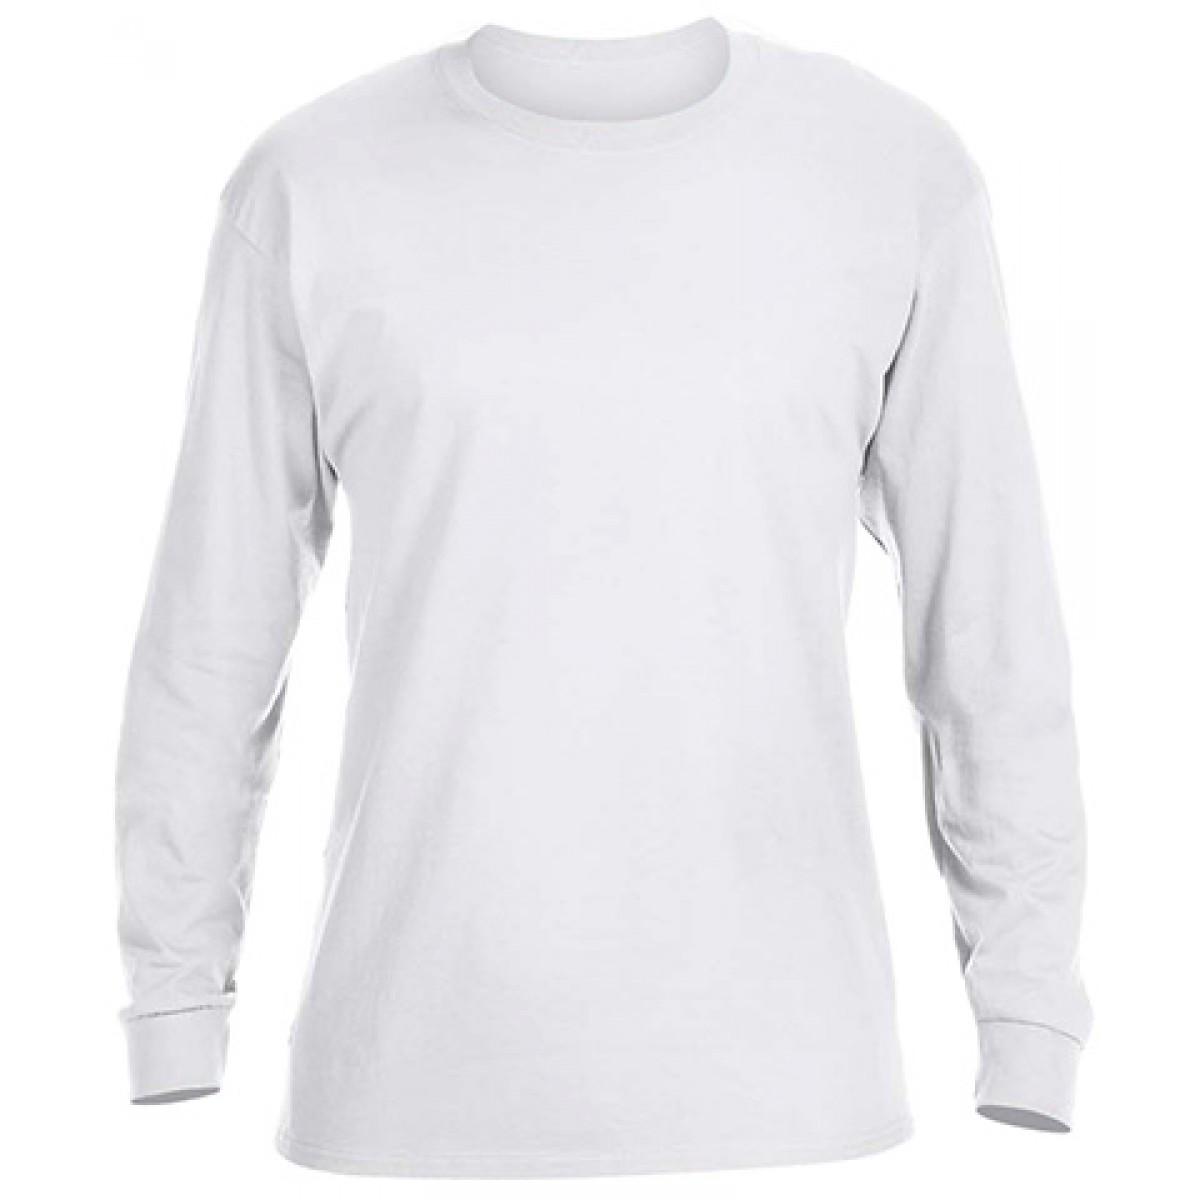 Heavy Cotton Long-Sleeve Adidas Shirt-White-S